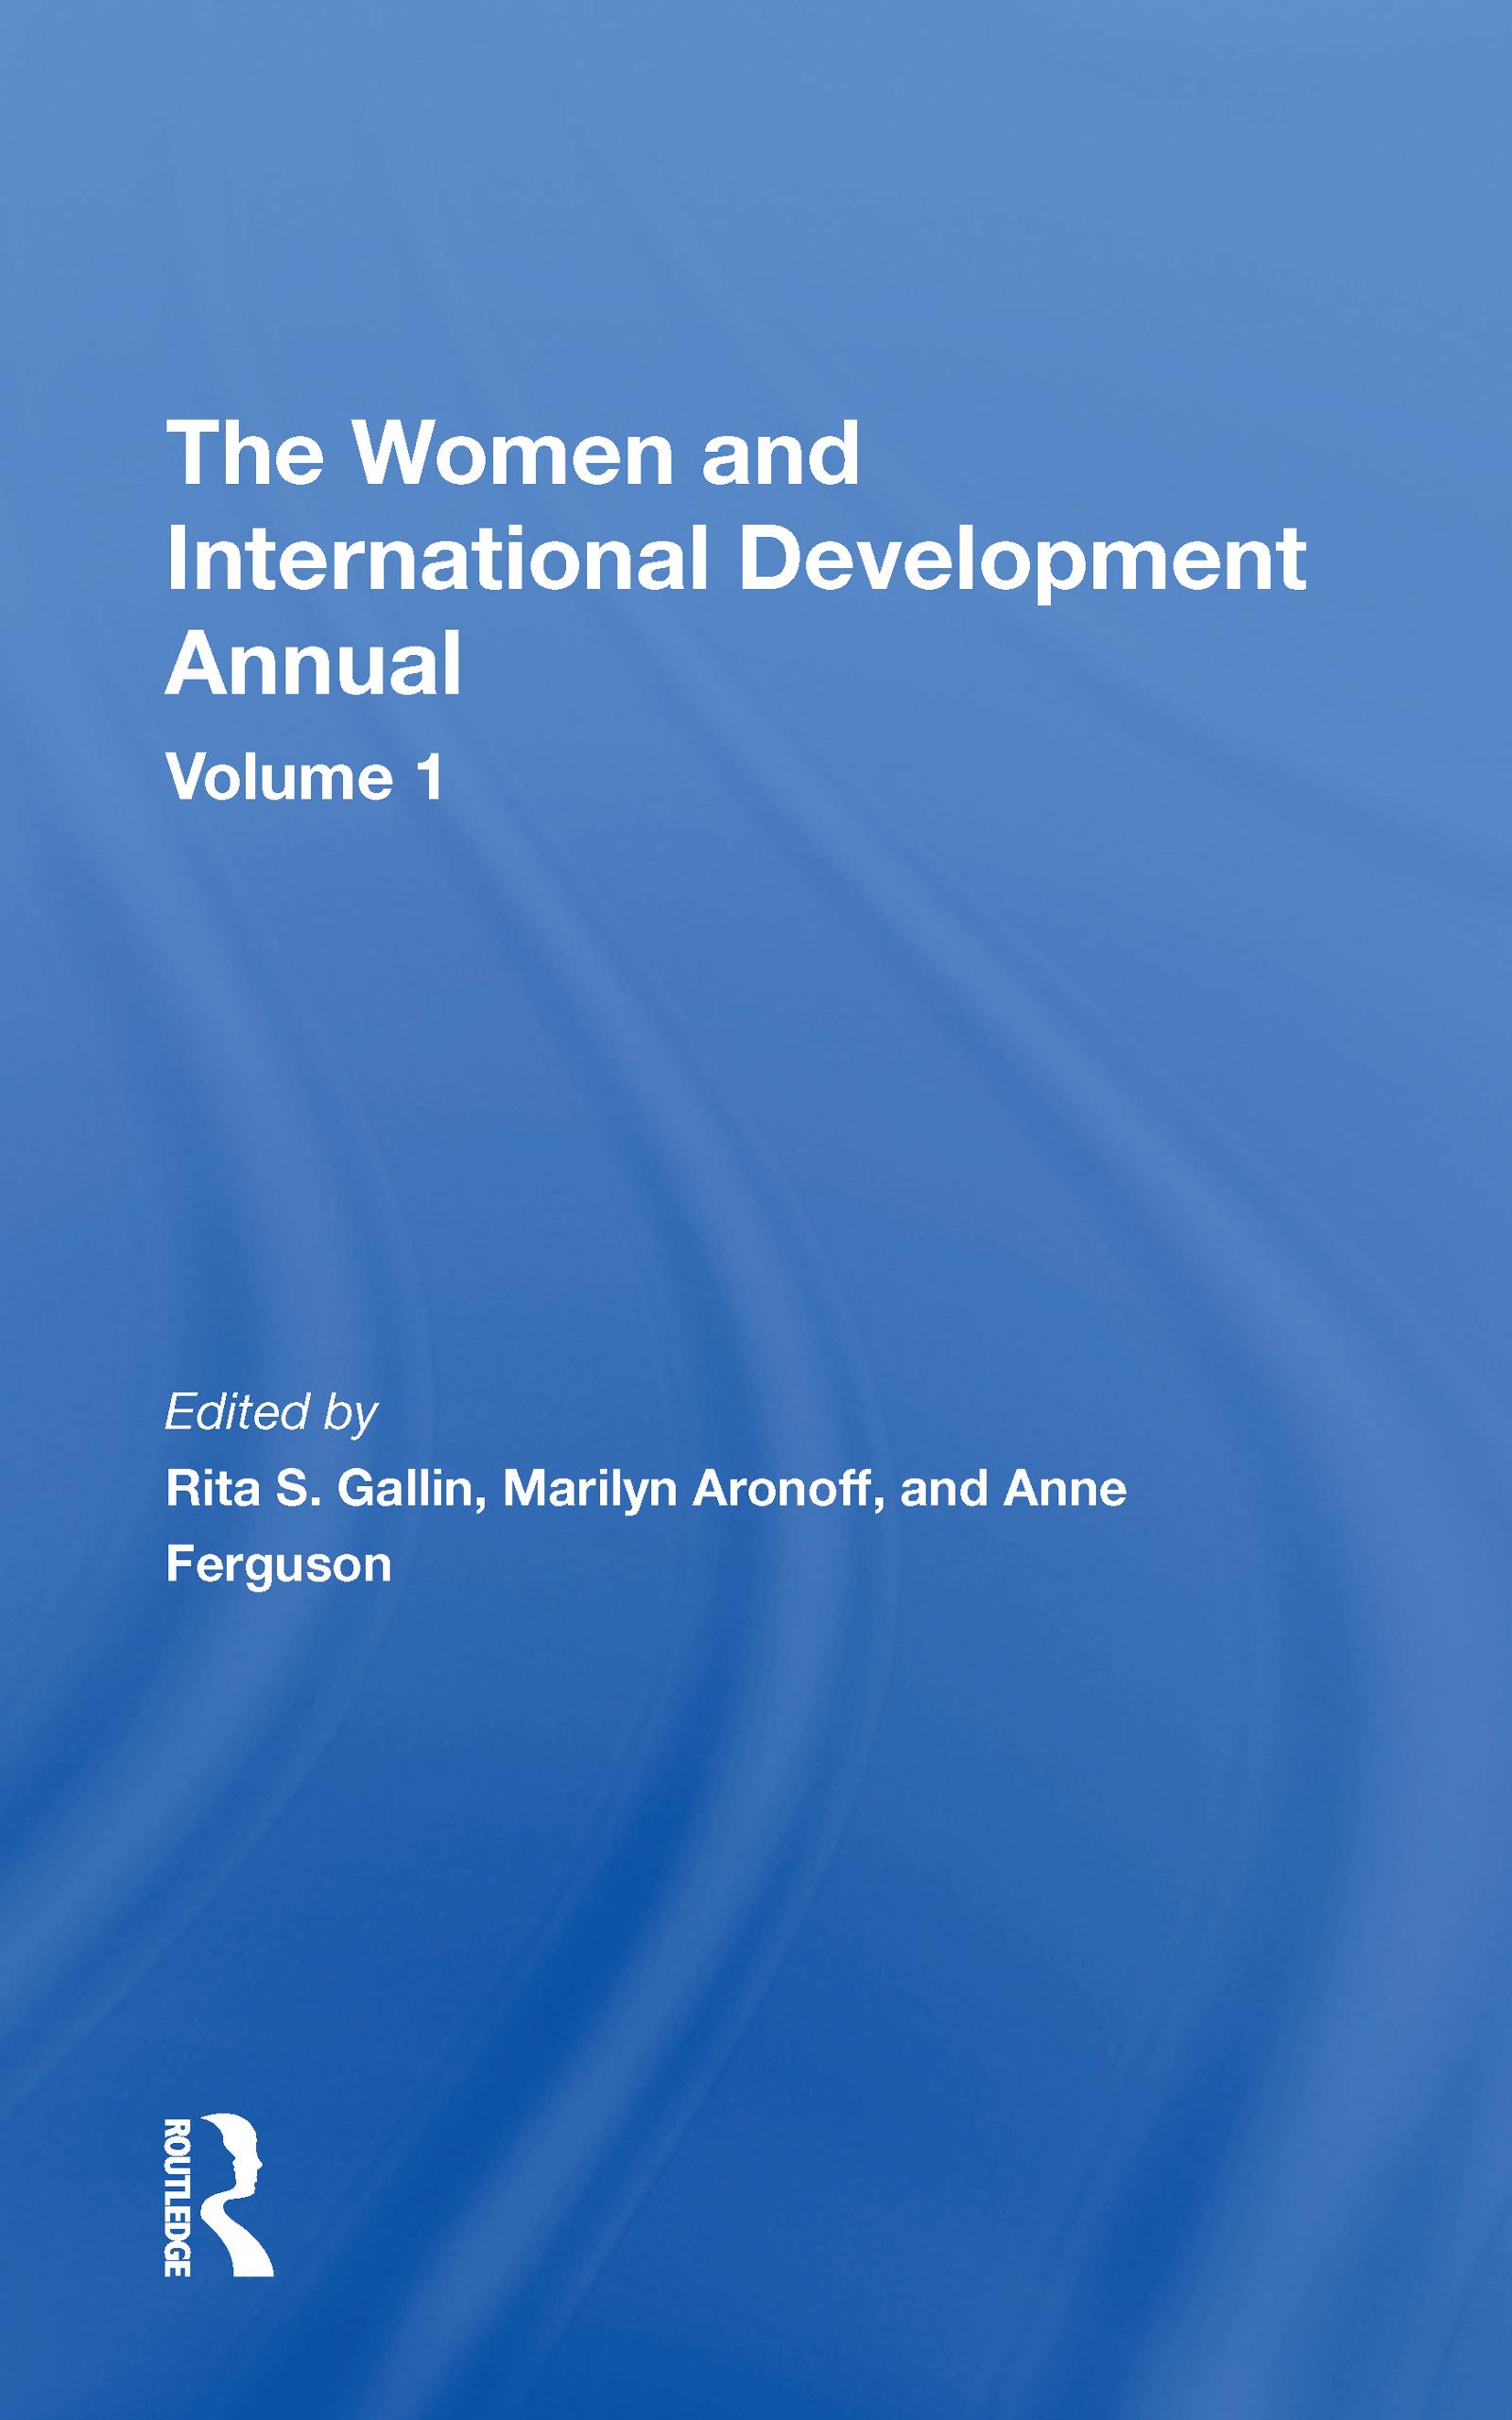 The Women And International Development Annual, Volume 1